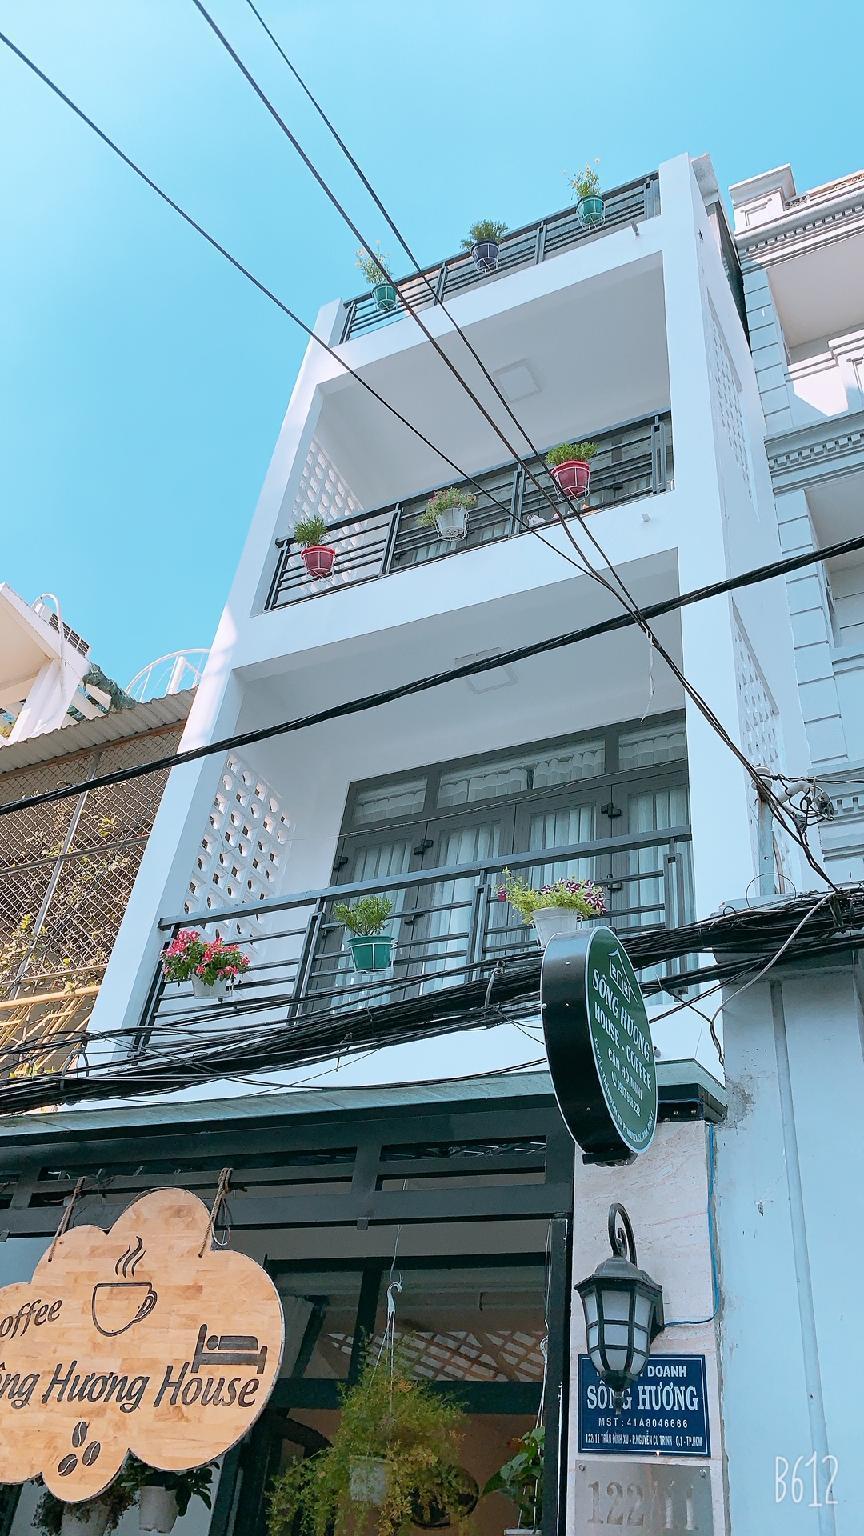 Song Huong House